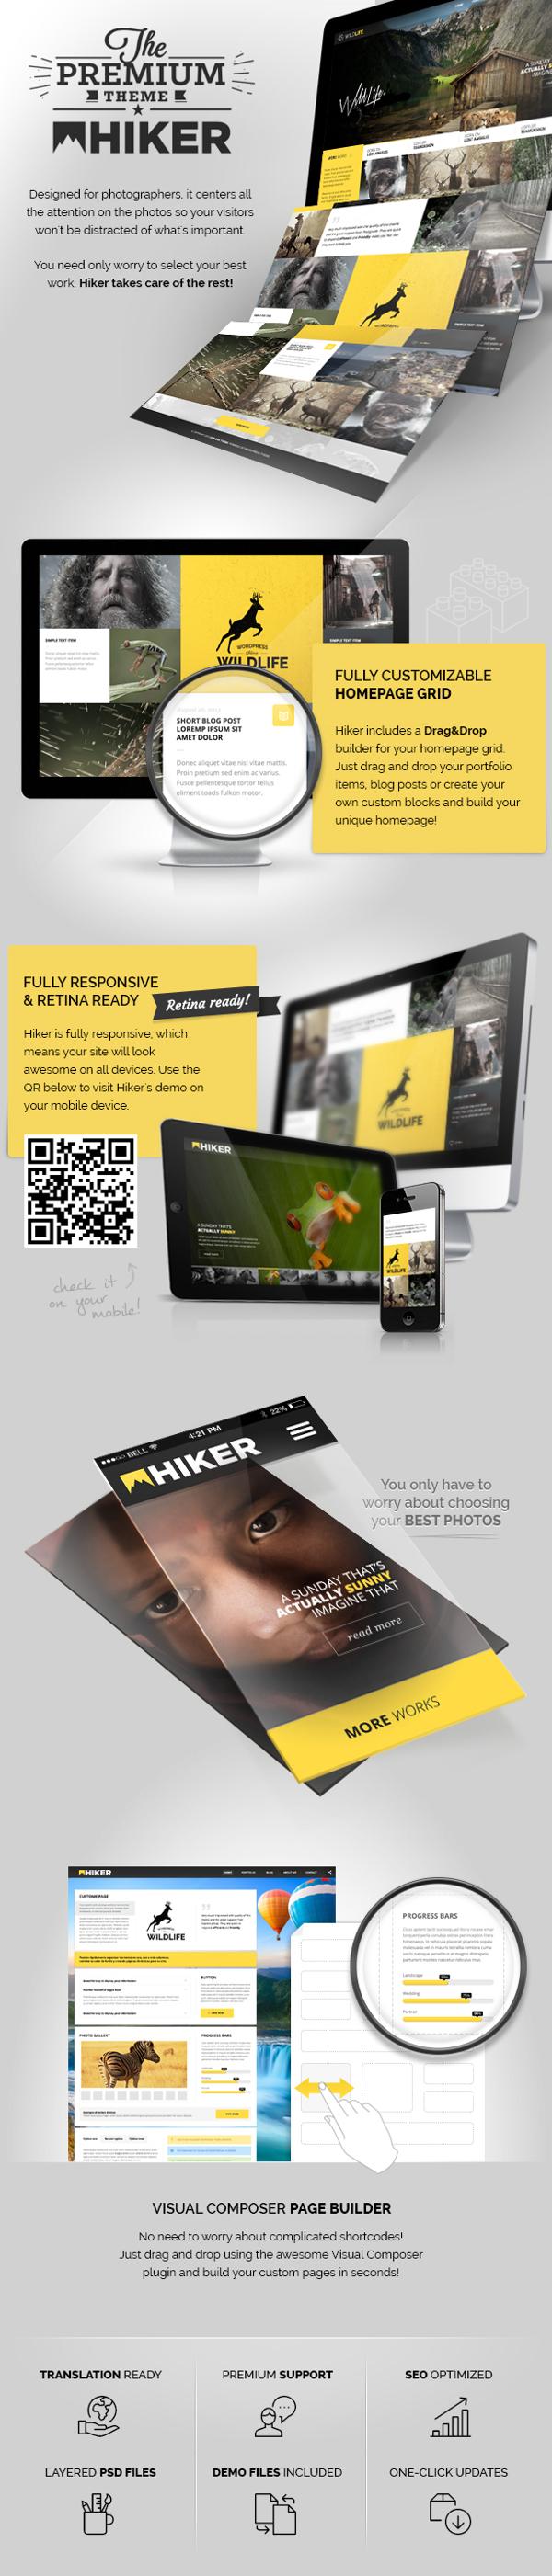 HIKER - Photography WP Theme by CreAtive Web Themes, via Behance